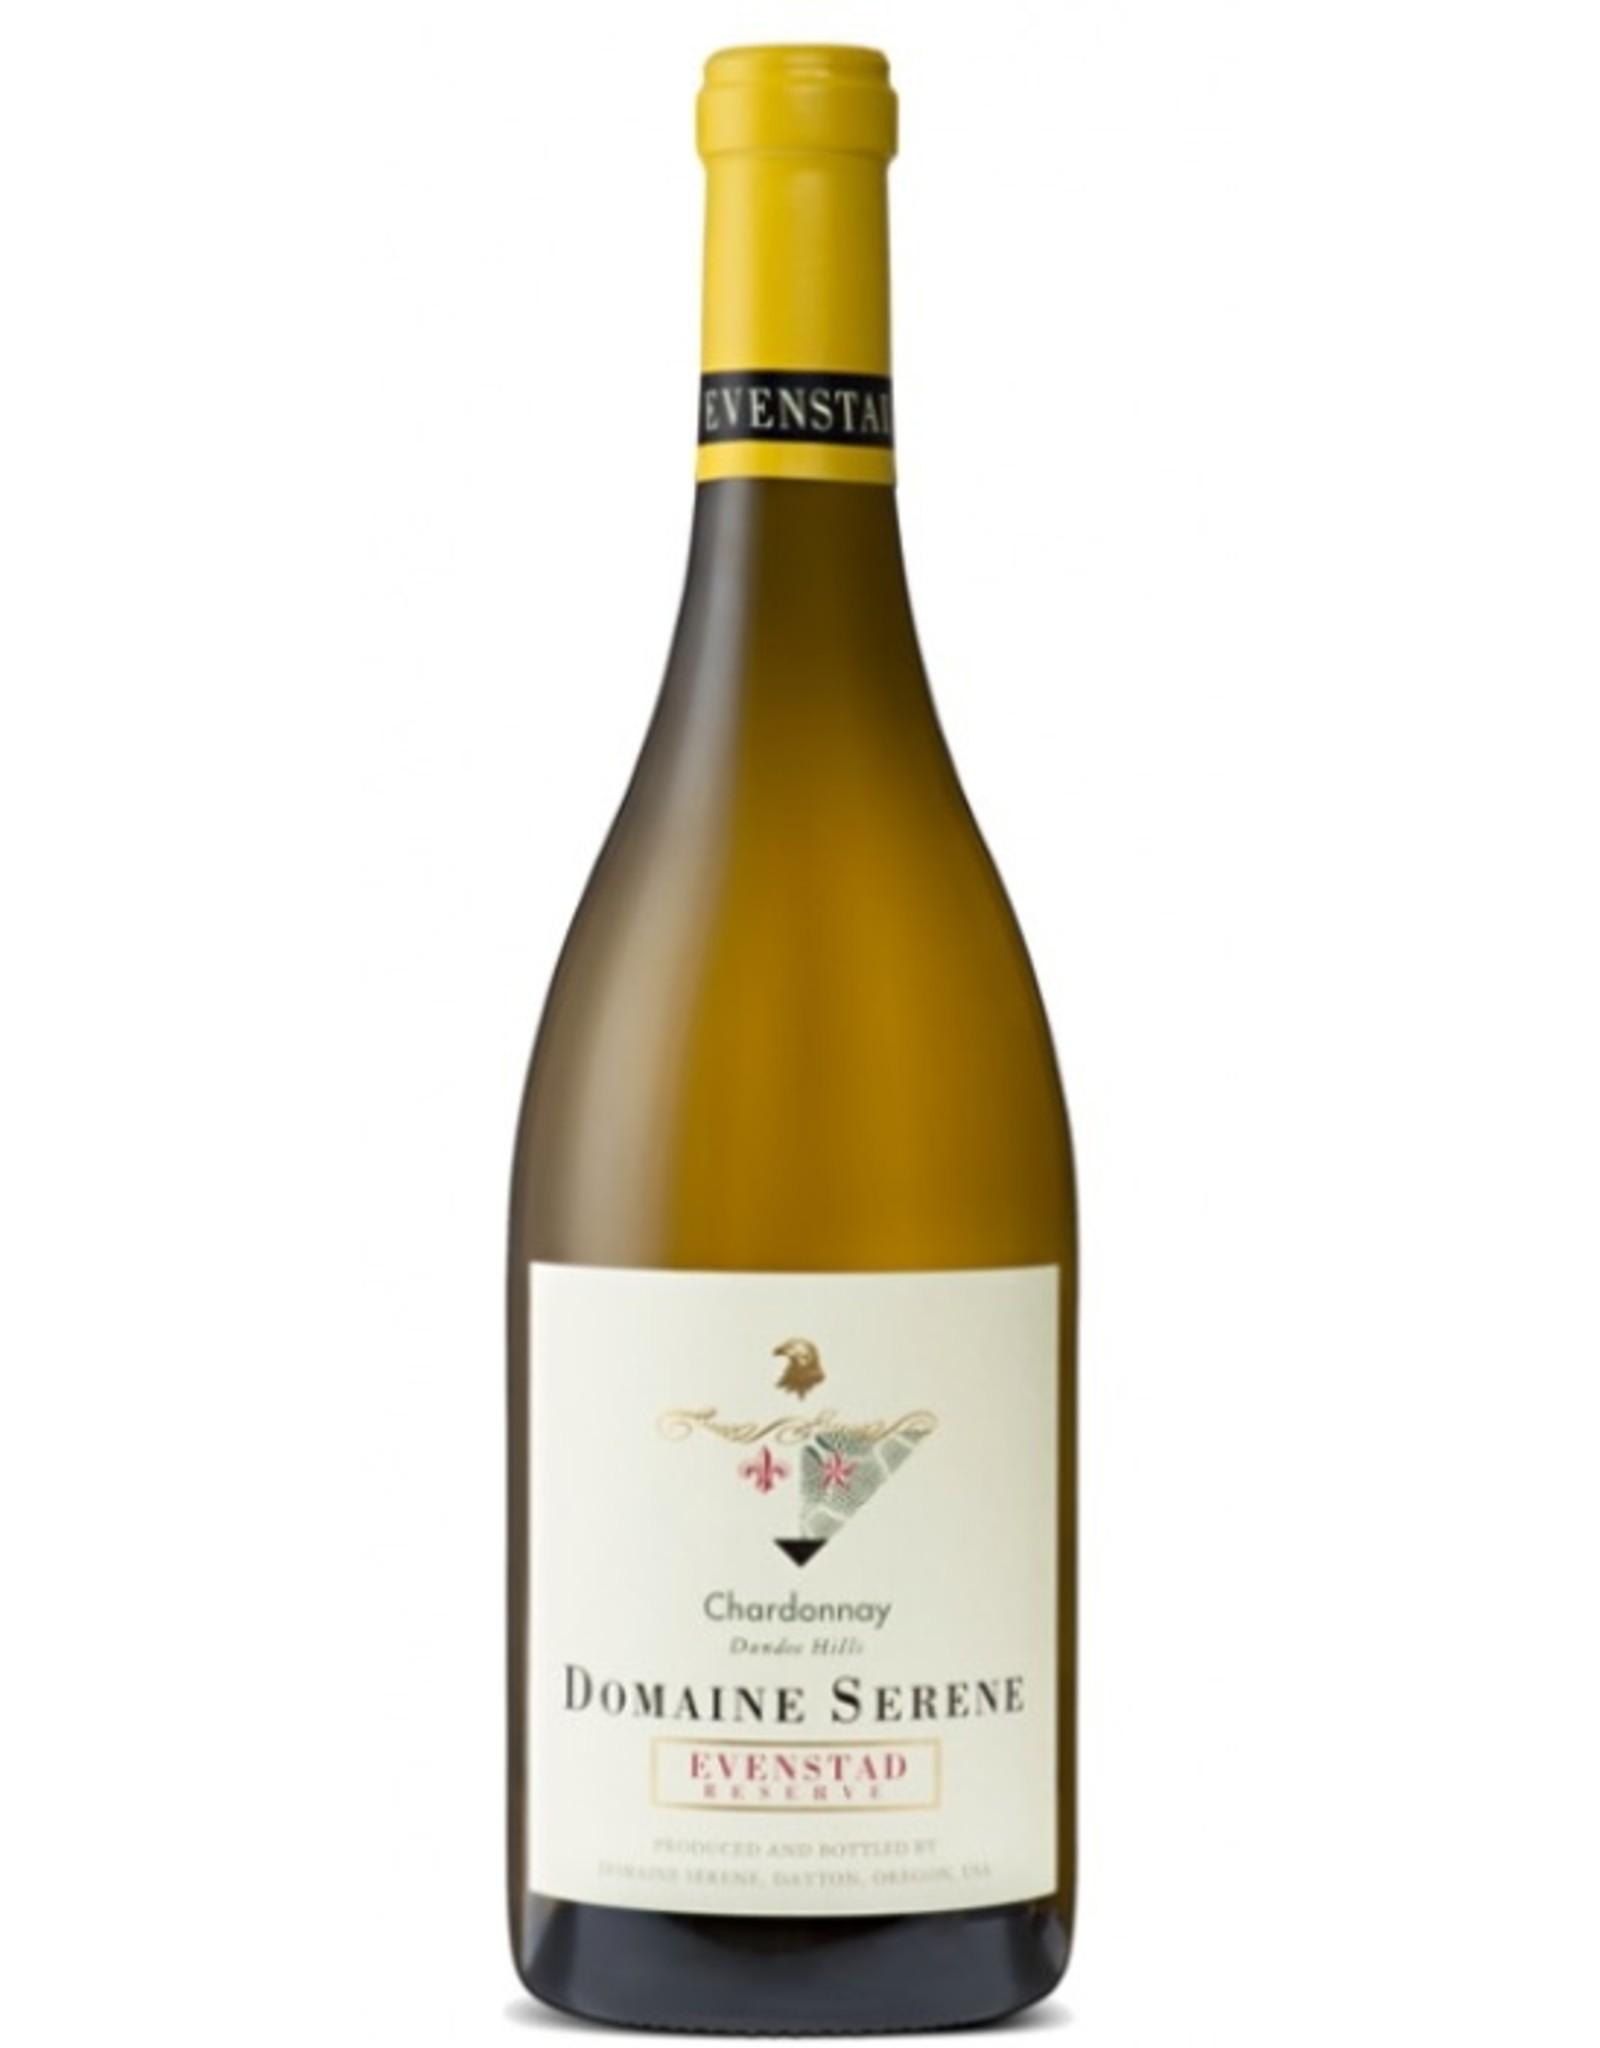 White Wine 2016, Domaine Serene Evenstad Reserve, Chardonnay, Dundee Hills, Willamette Valley, Oregon, 13.9% Alc., JS94